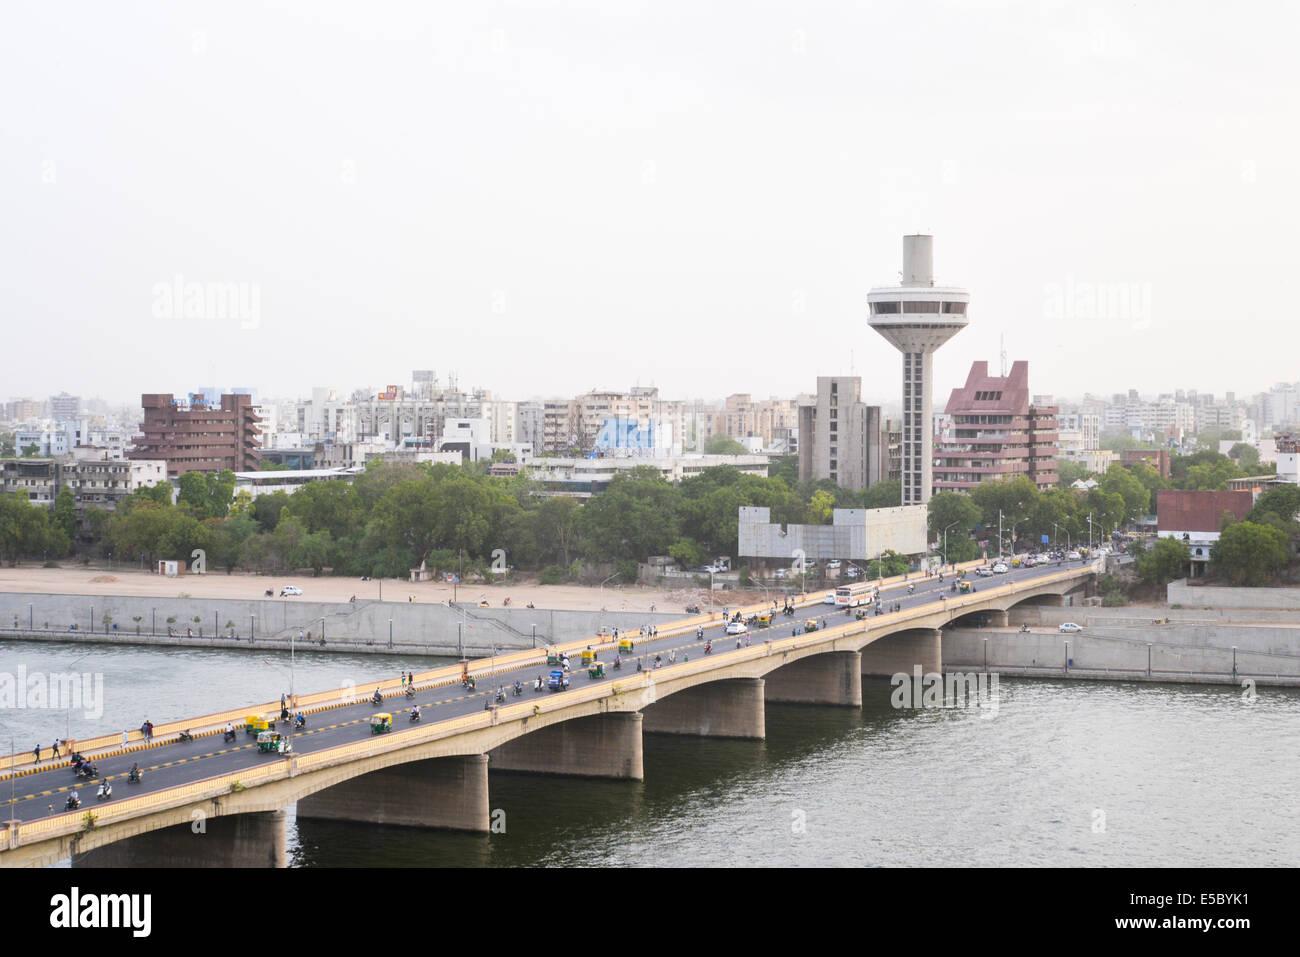 Ahmedabad riverfront. - Stock Image